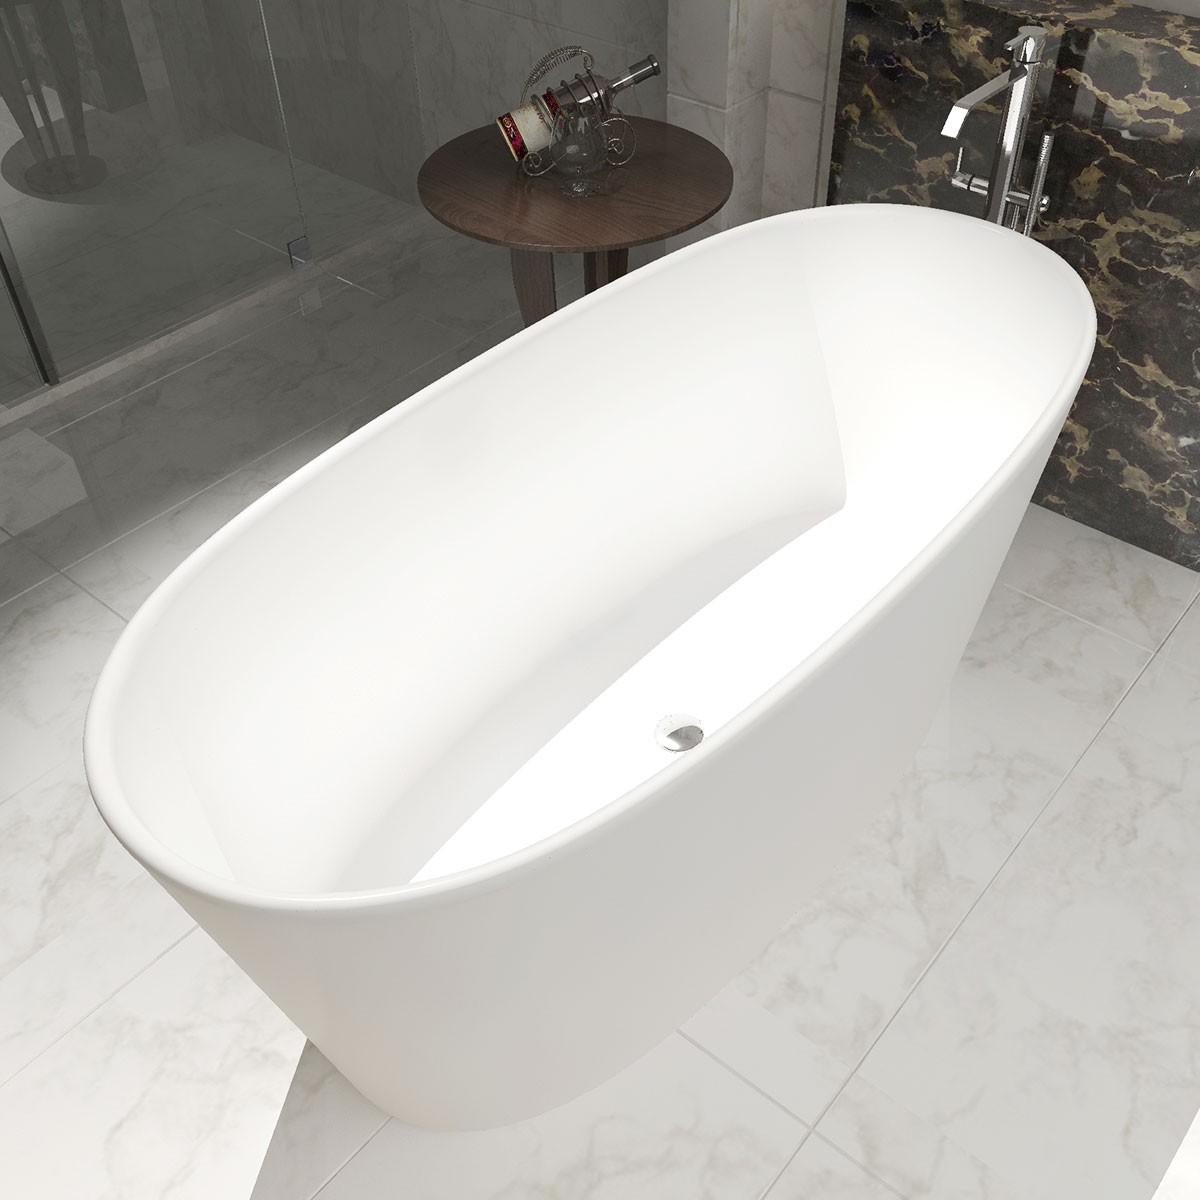 62 In Oval Synthetic Stone Freestanding Bathtub – Matte White (DK-HA8602)